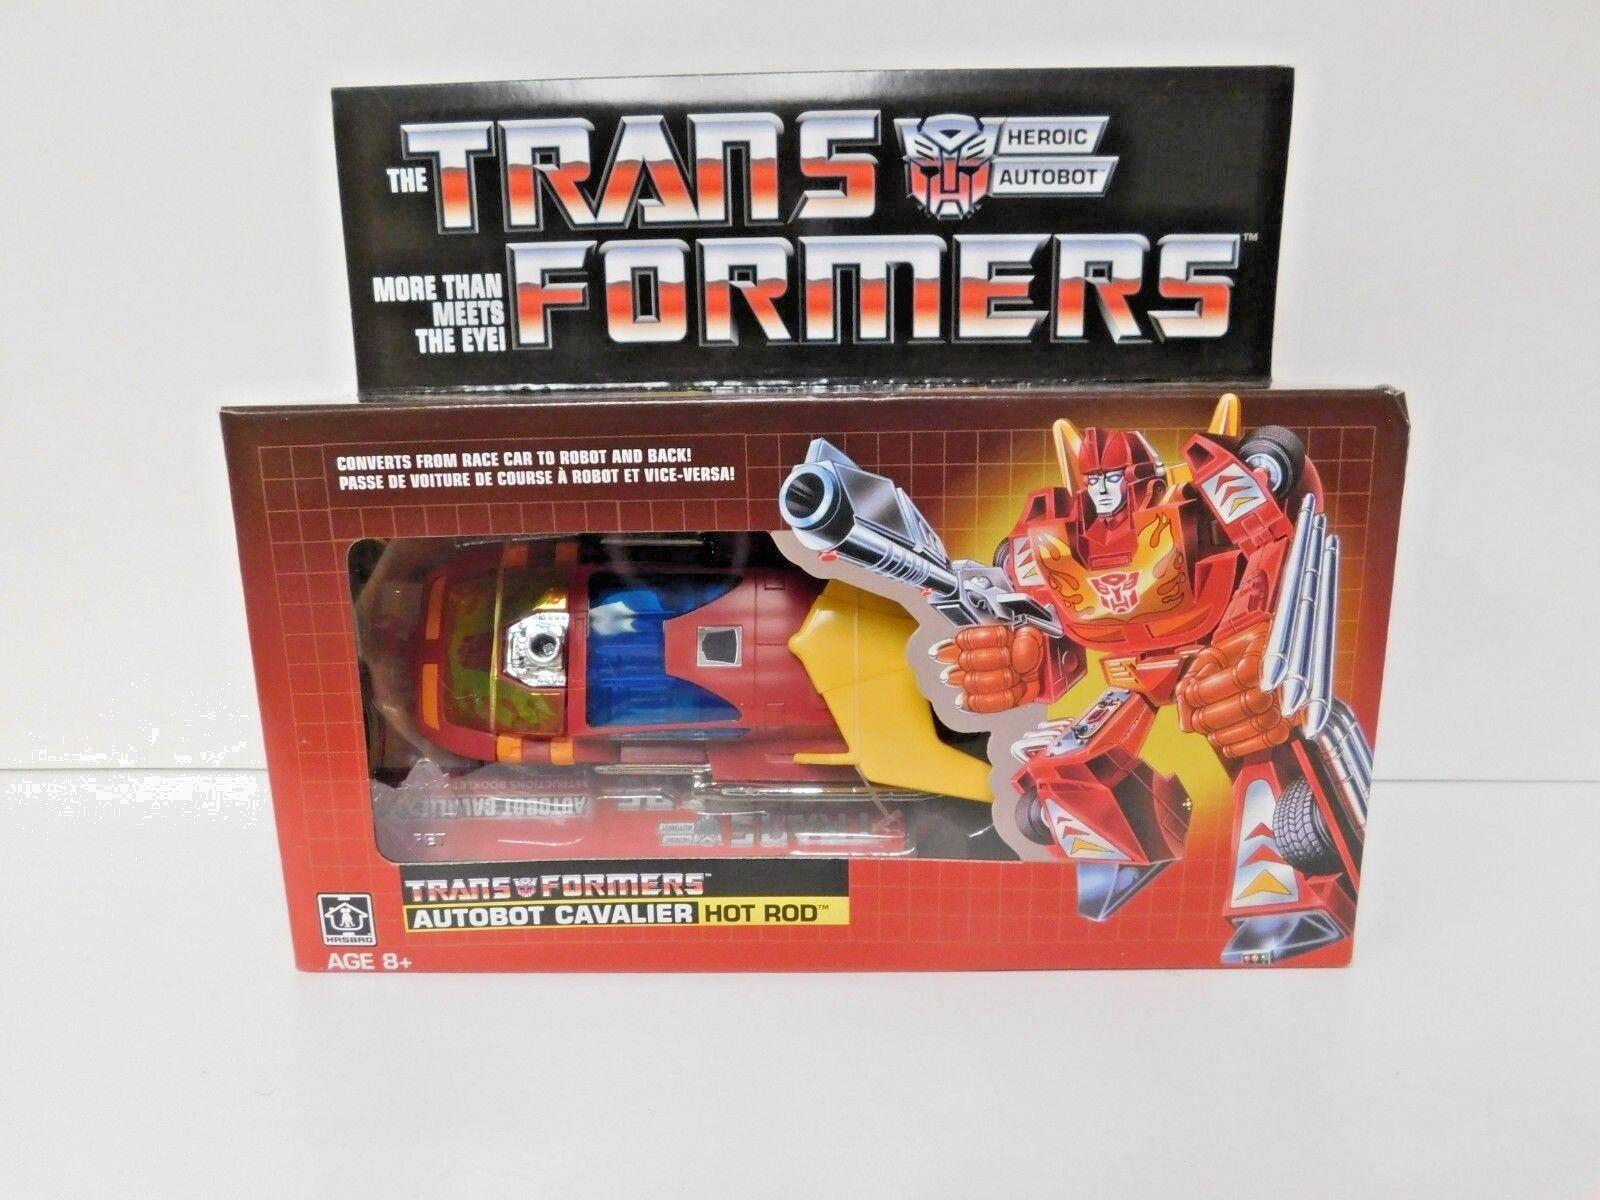 Transformers Heroic Autobot Cavalier Hot Rod